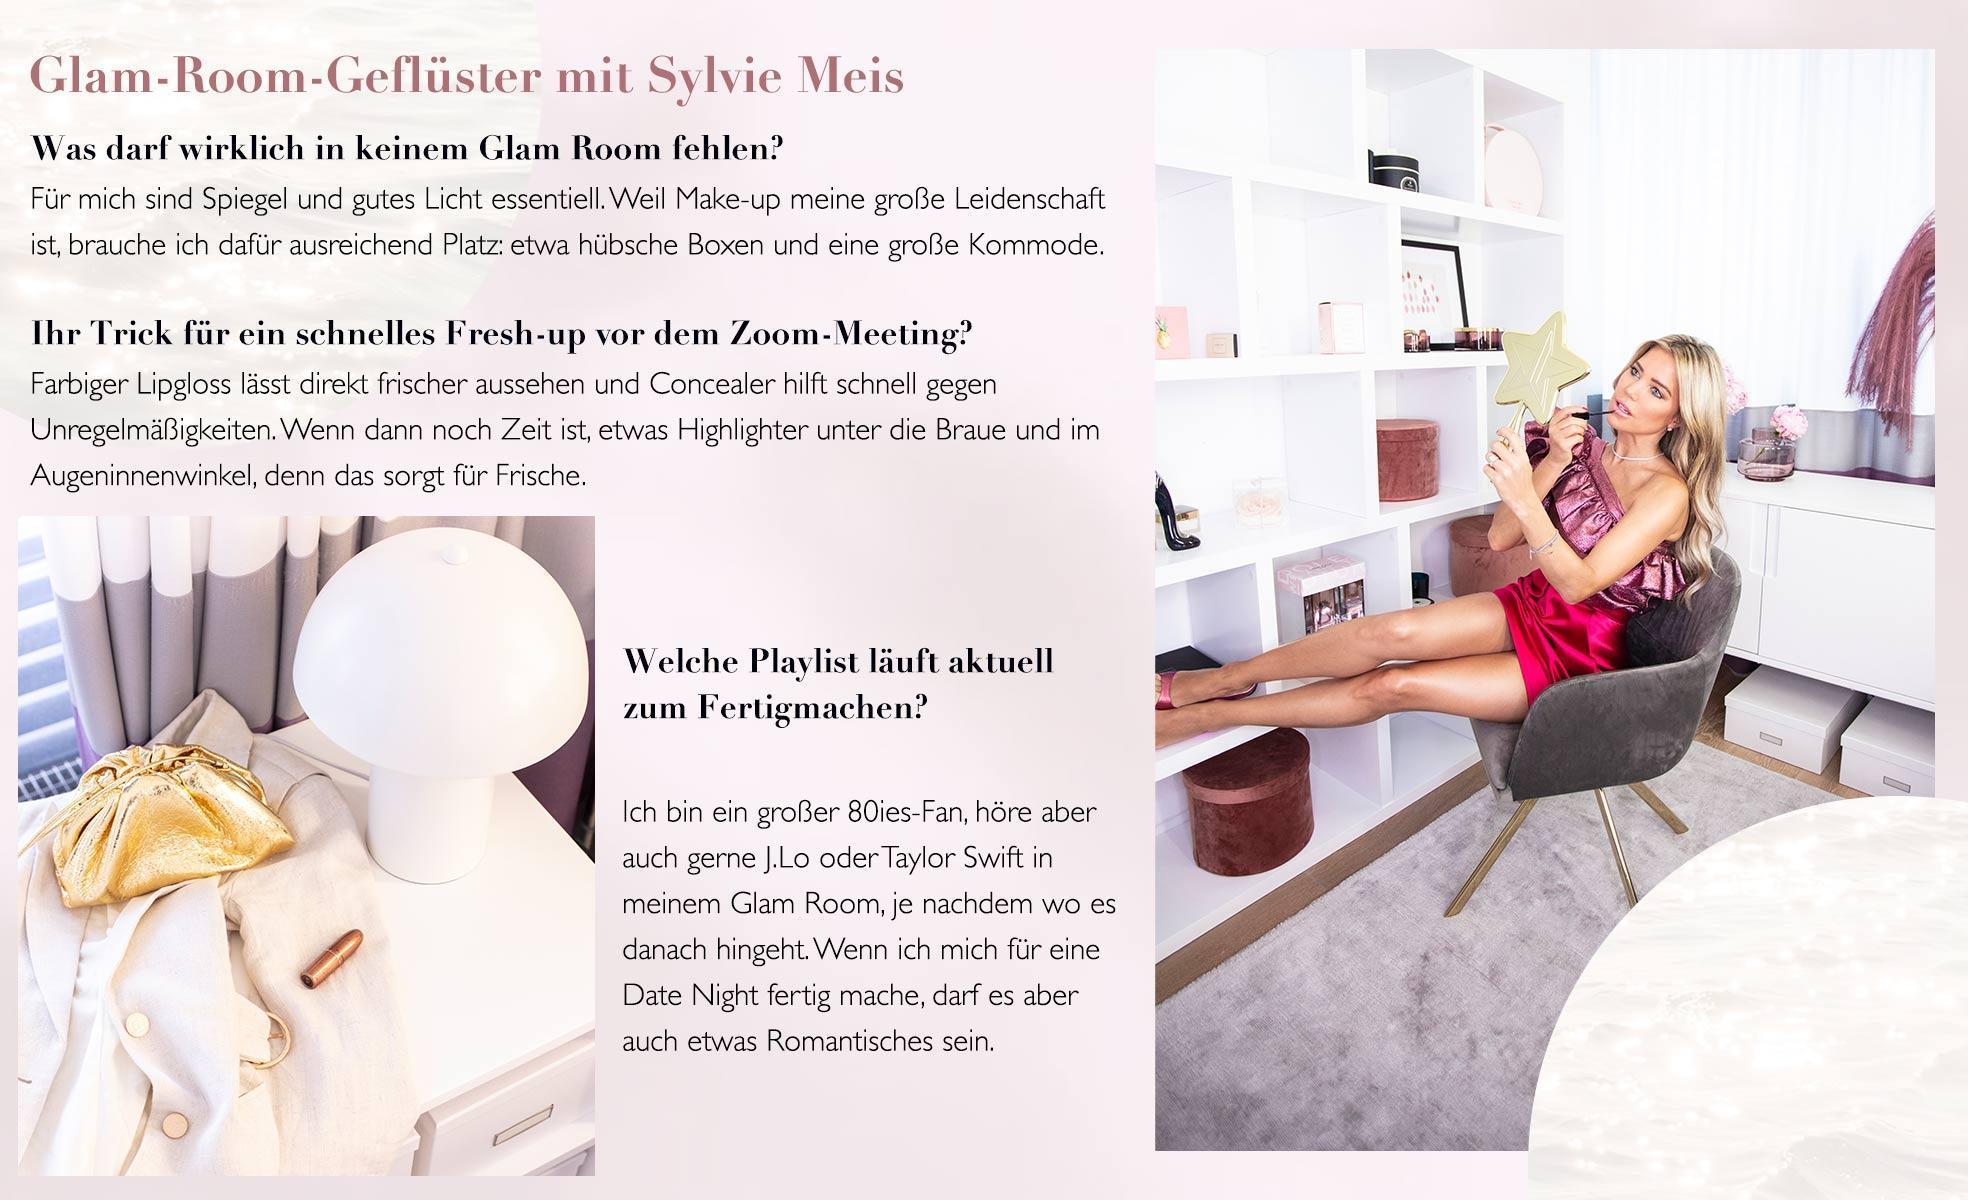 Sylvie Meiss Glam Room Tricks Make Up Playlist